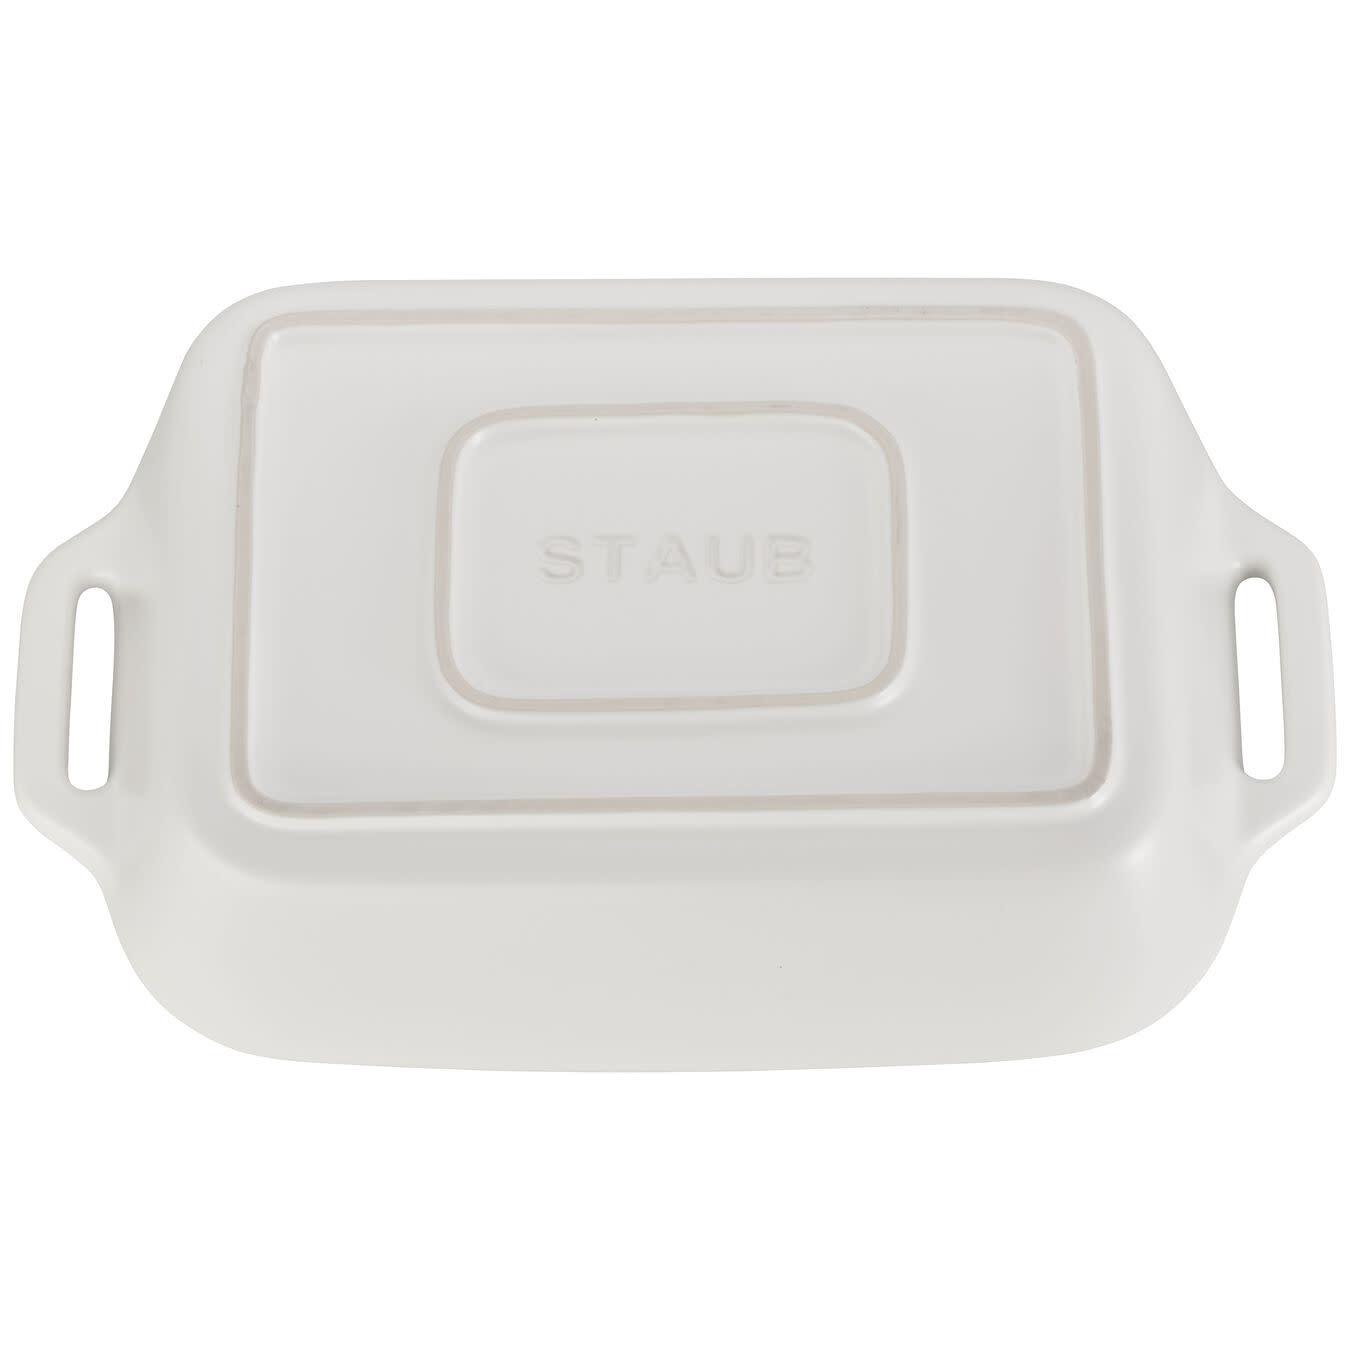 Staub Rectangular Dish Set 2pc Matte White